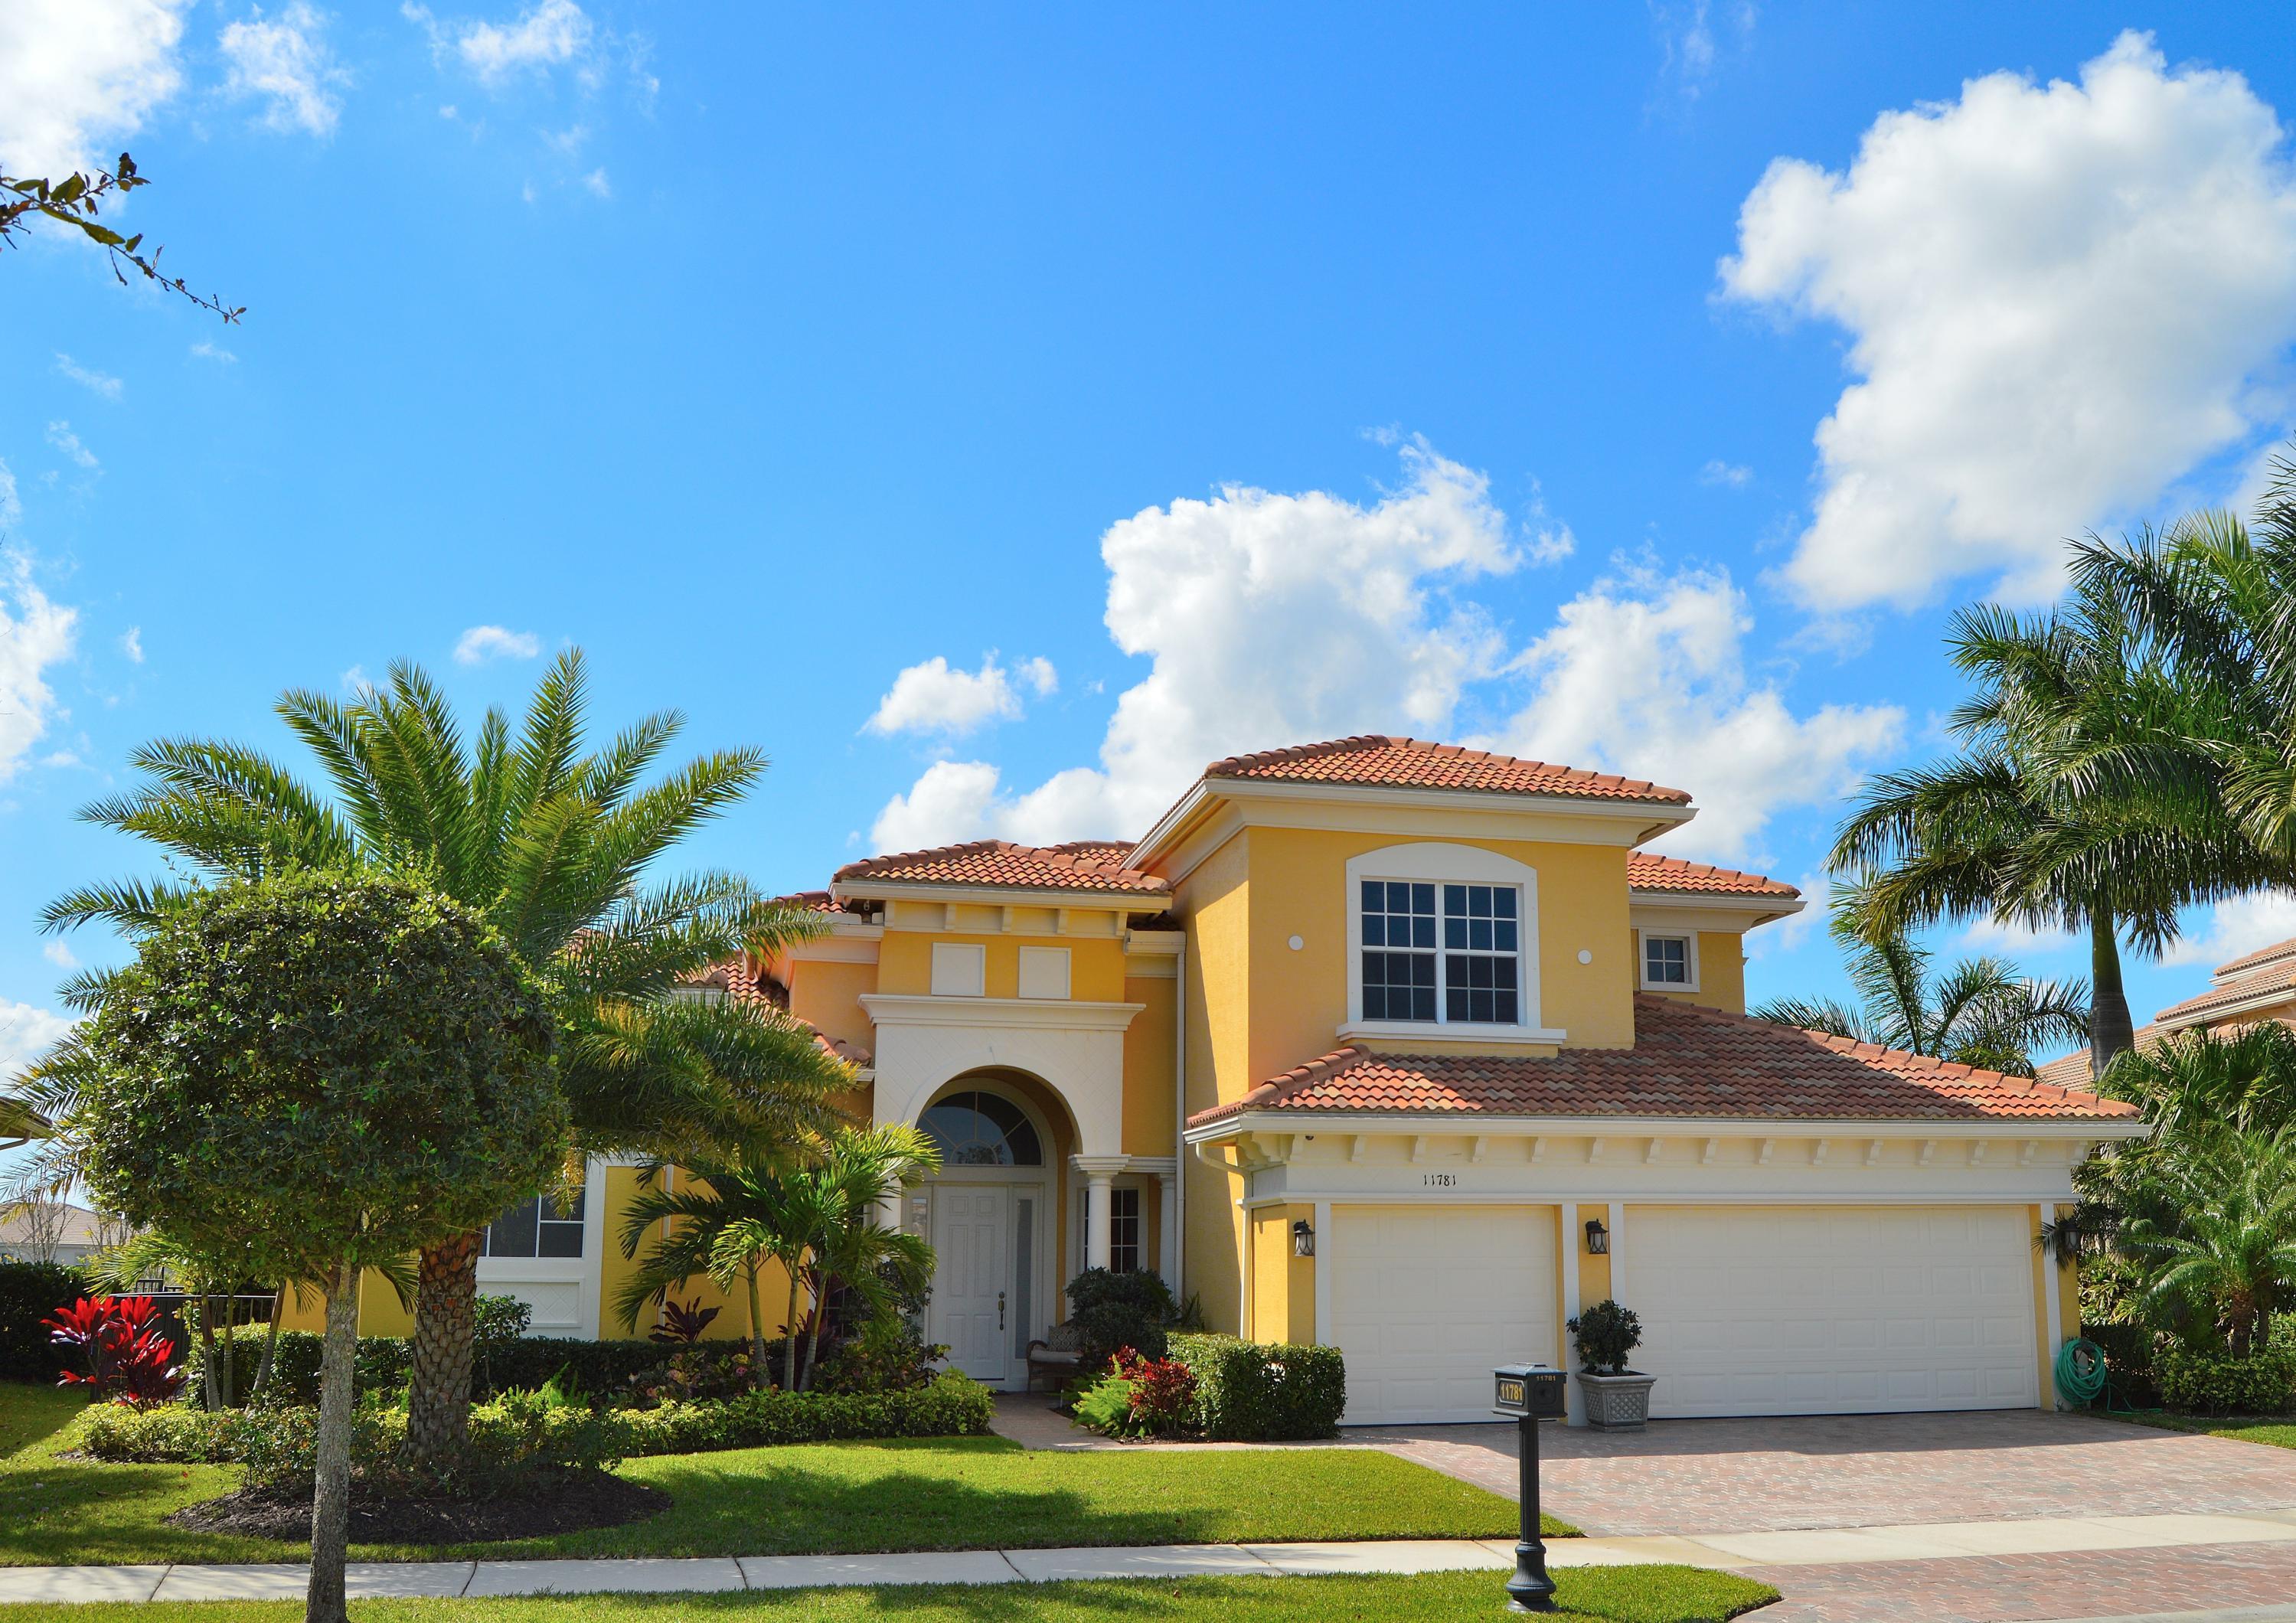 11781 Sw Rossano Lane, Port Saint Lucie, FL 34987